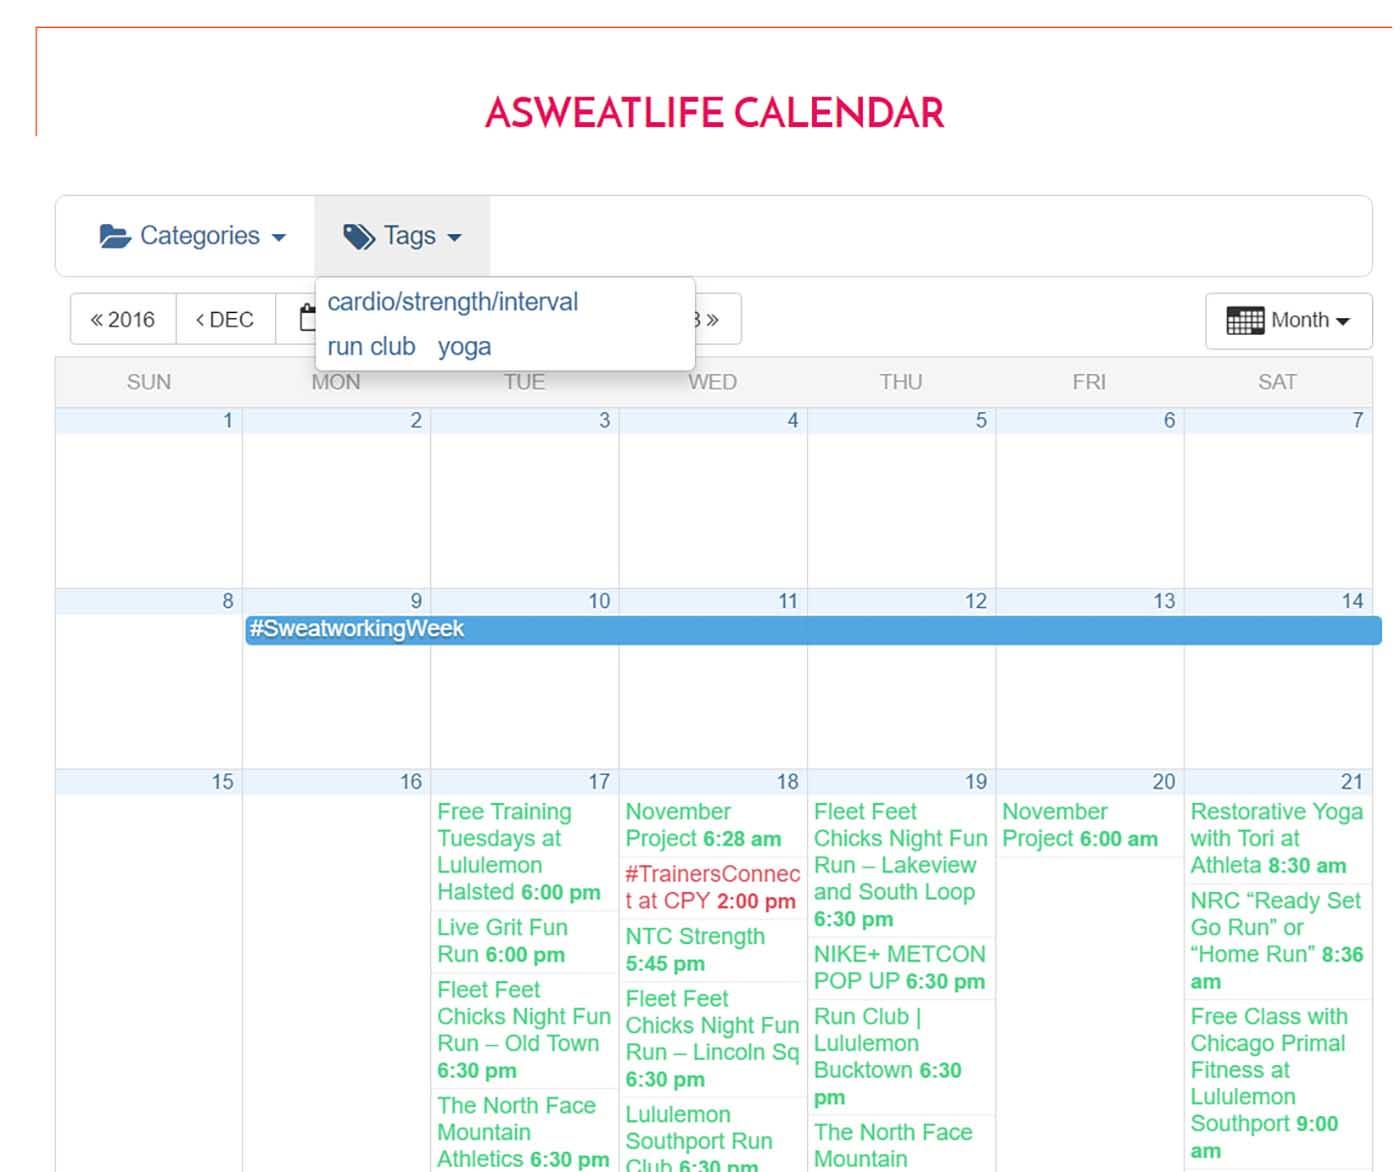 asweatlife_Your New Workout Go-To- Introducing the aSweatLife Calendar_1